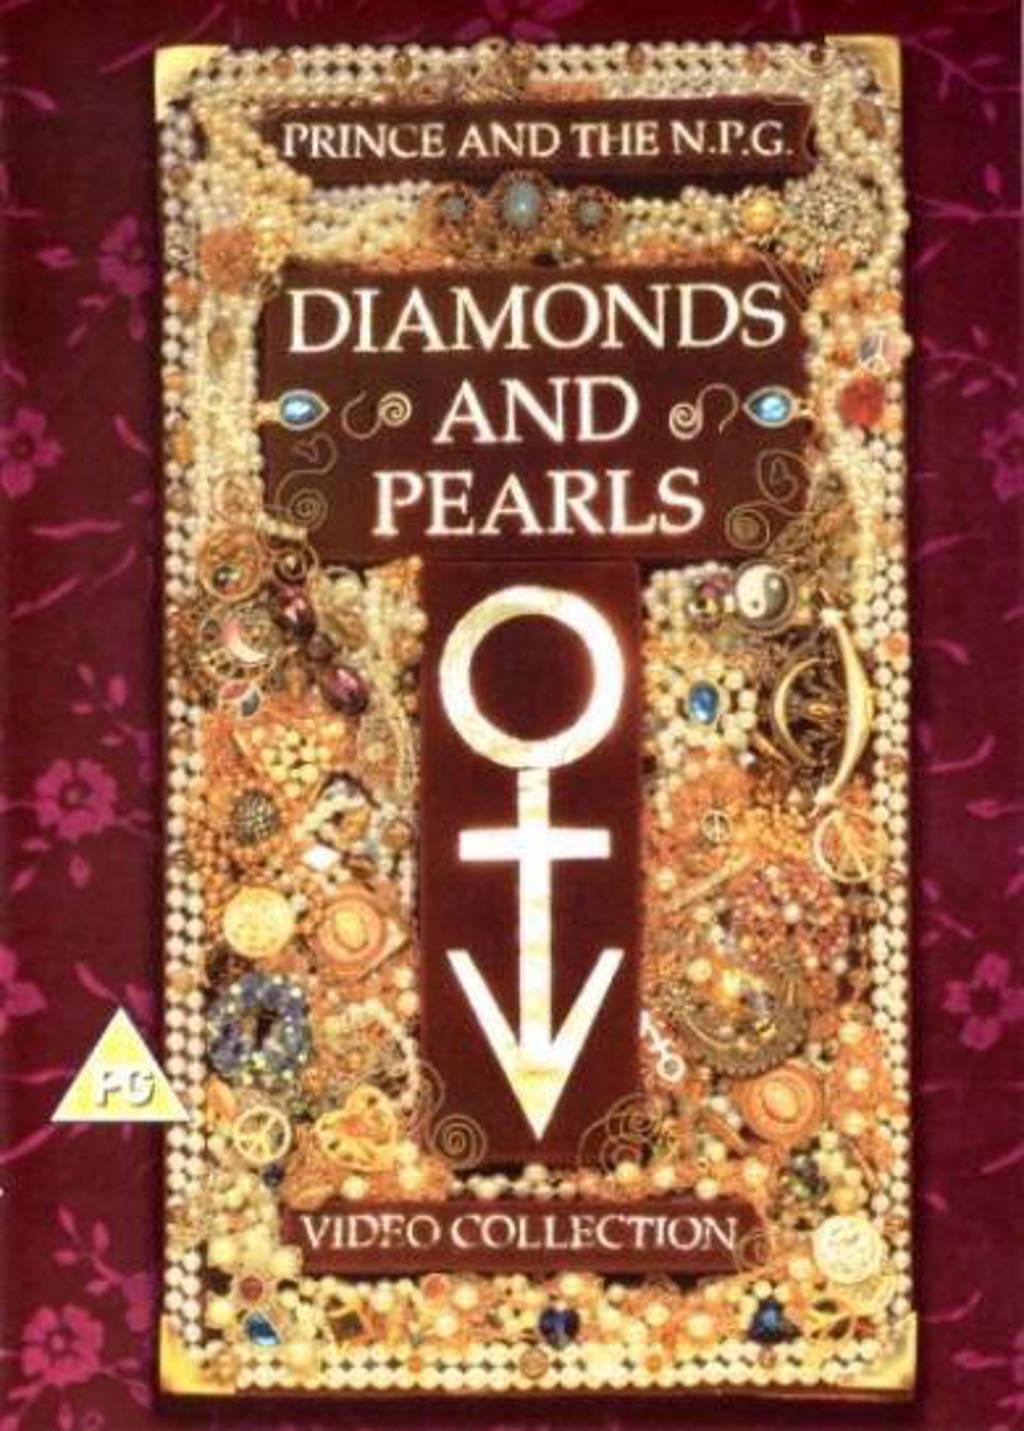 Prince - Diamonds And Pearls (DVD)